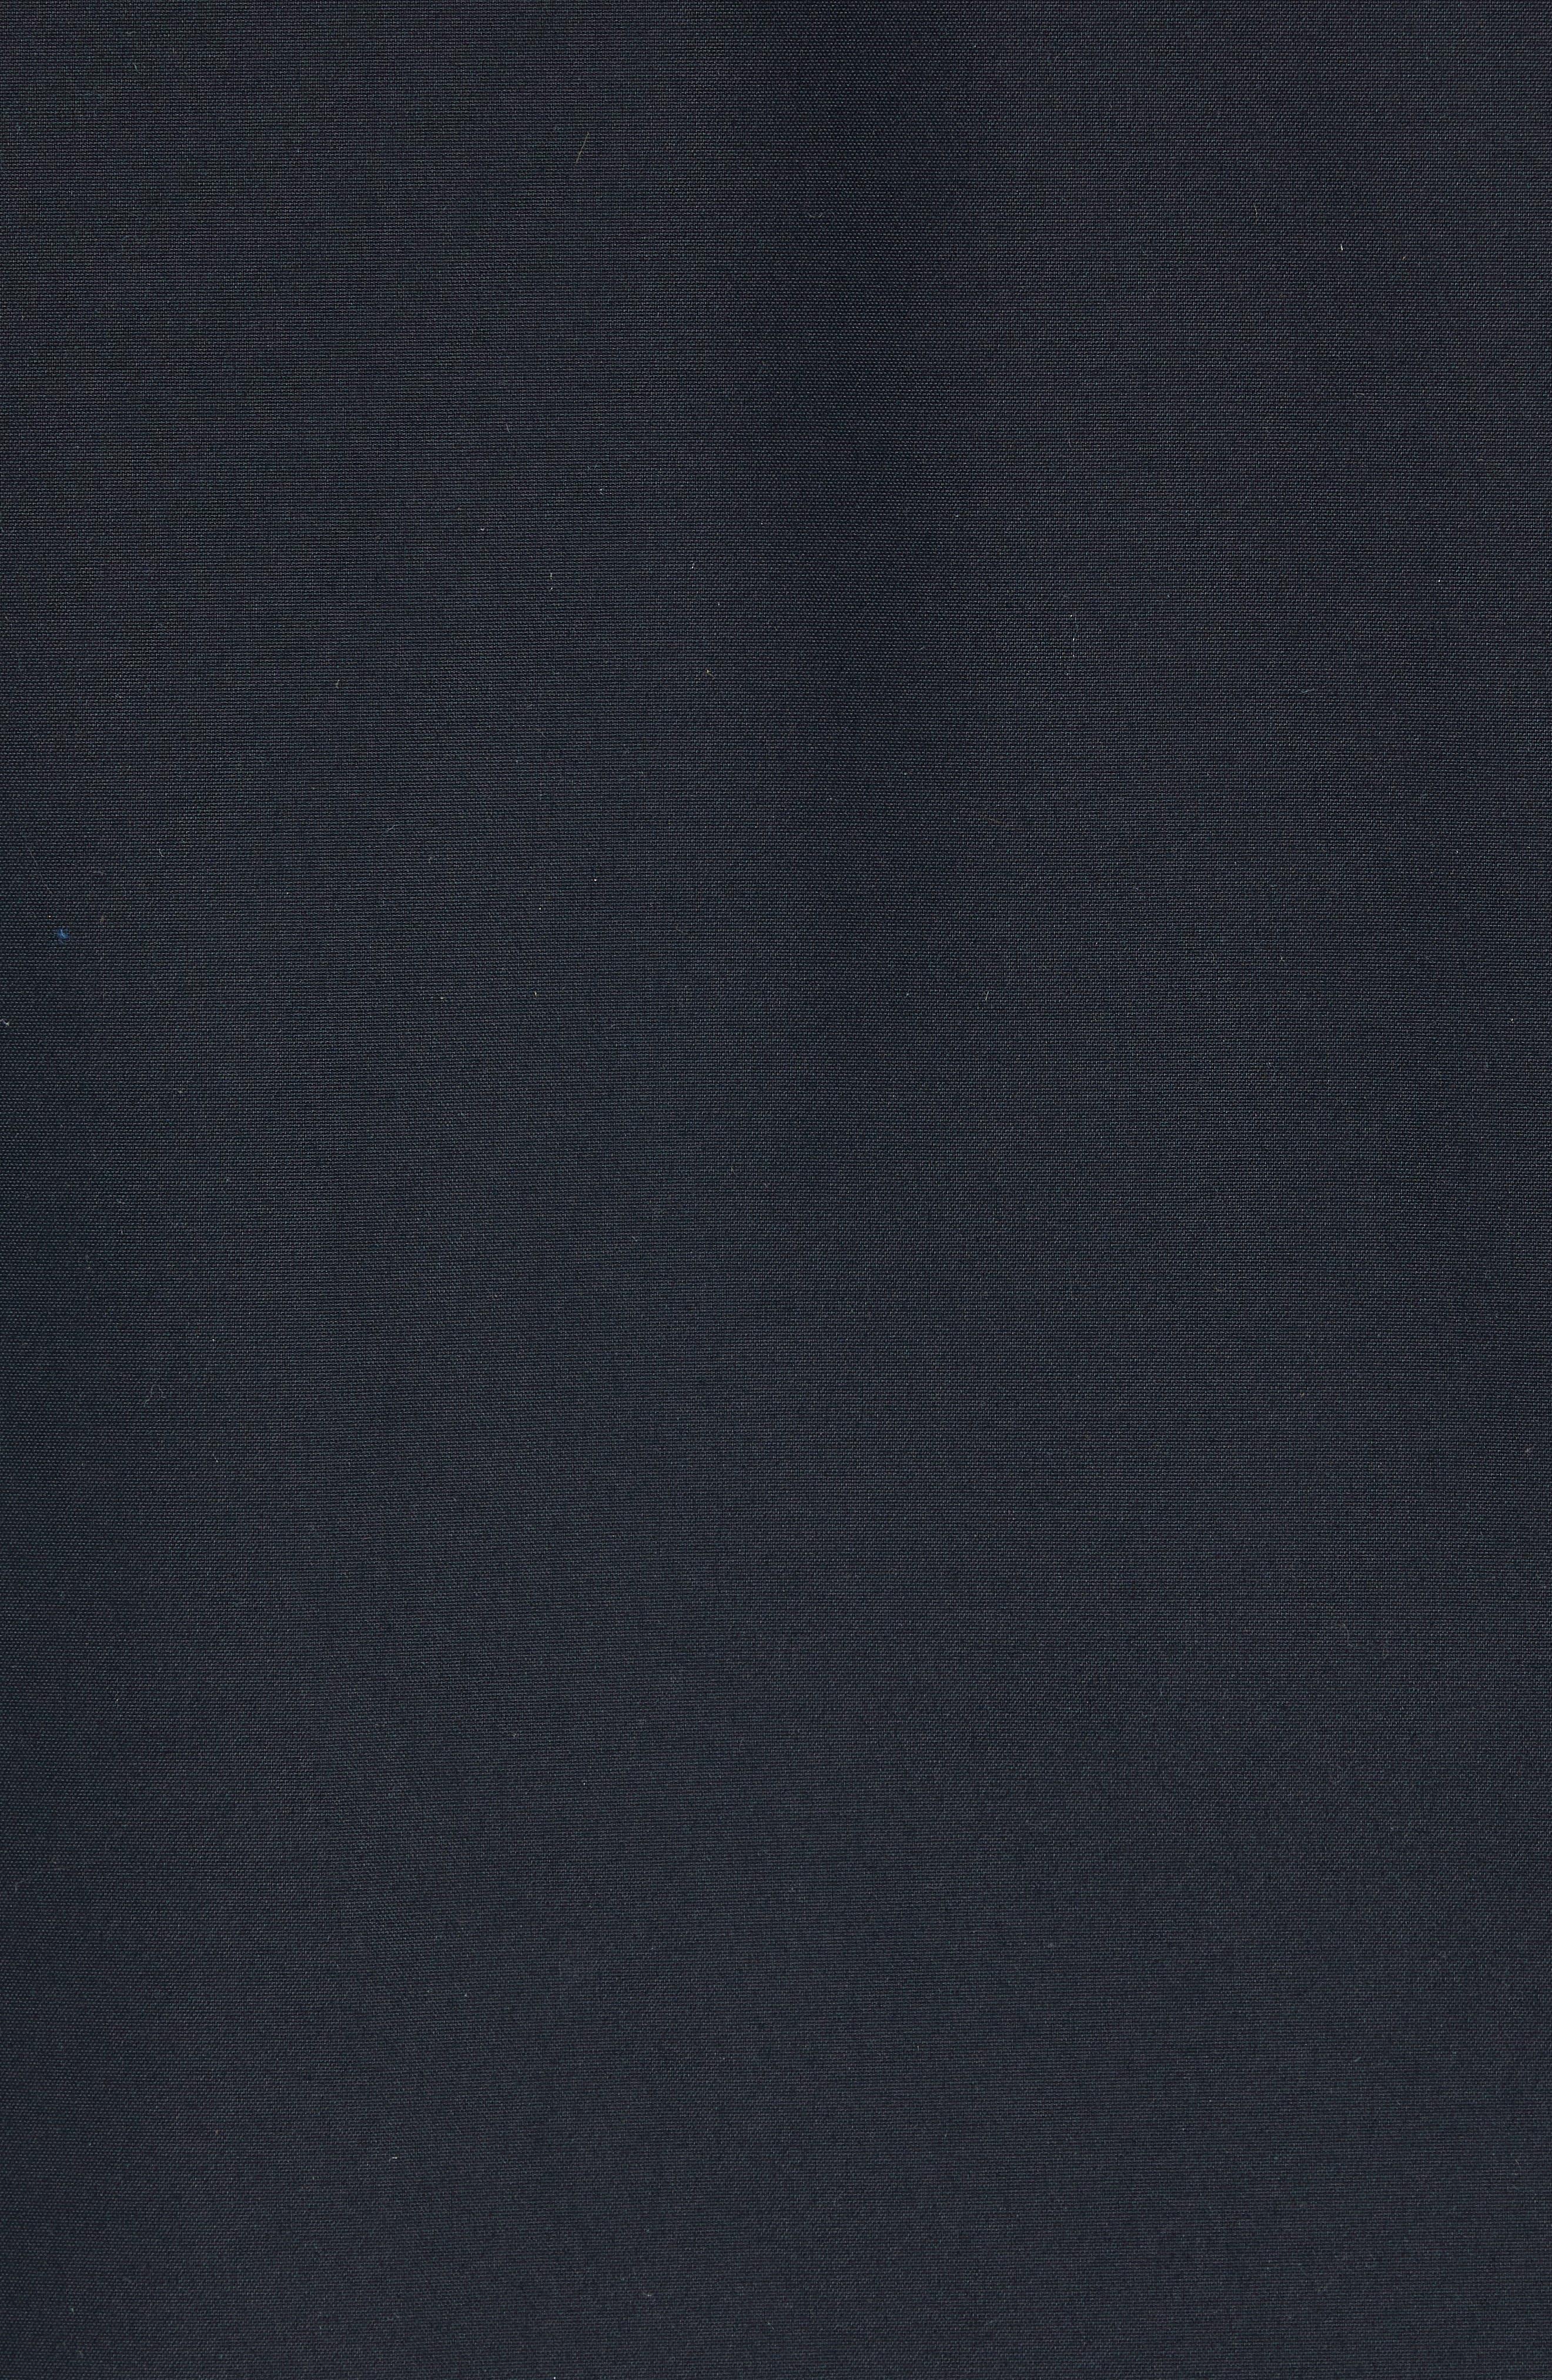 Hamilton 3-in-1 Down Parka with Genuine Fox Fur Trim,                             Alternate thumbnail 7, color,                             BLACK